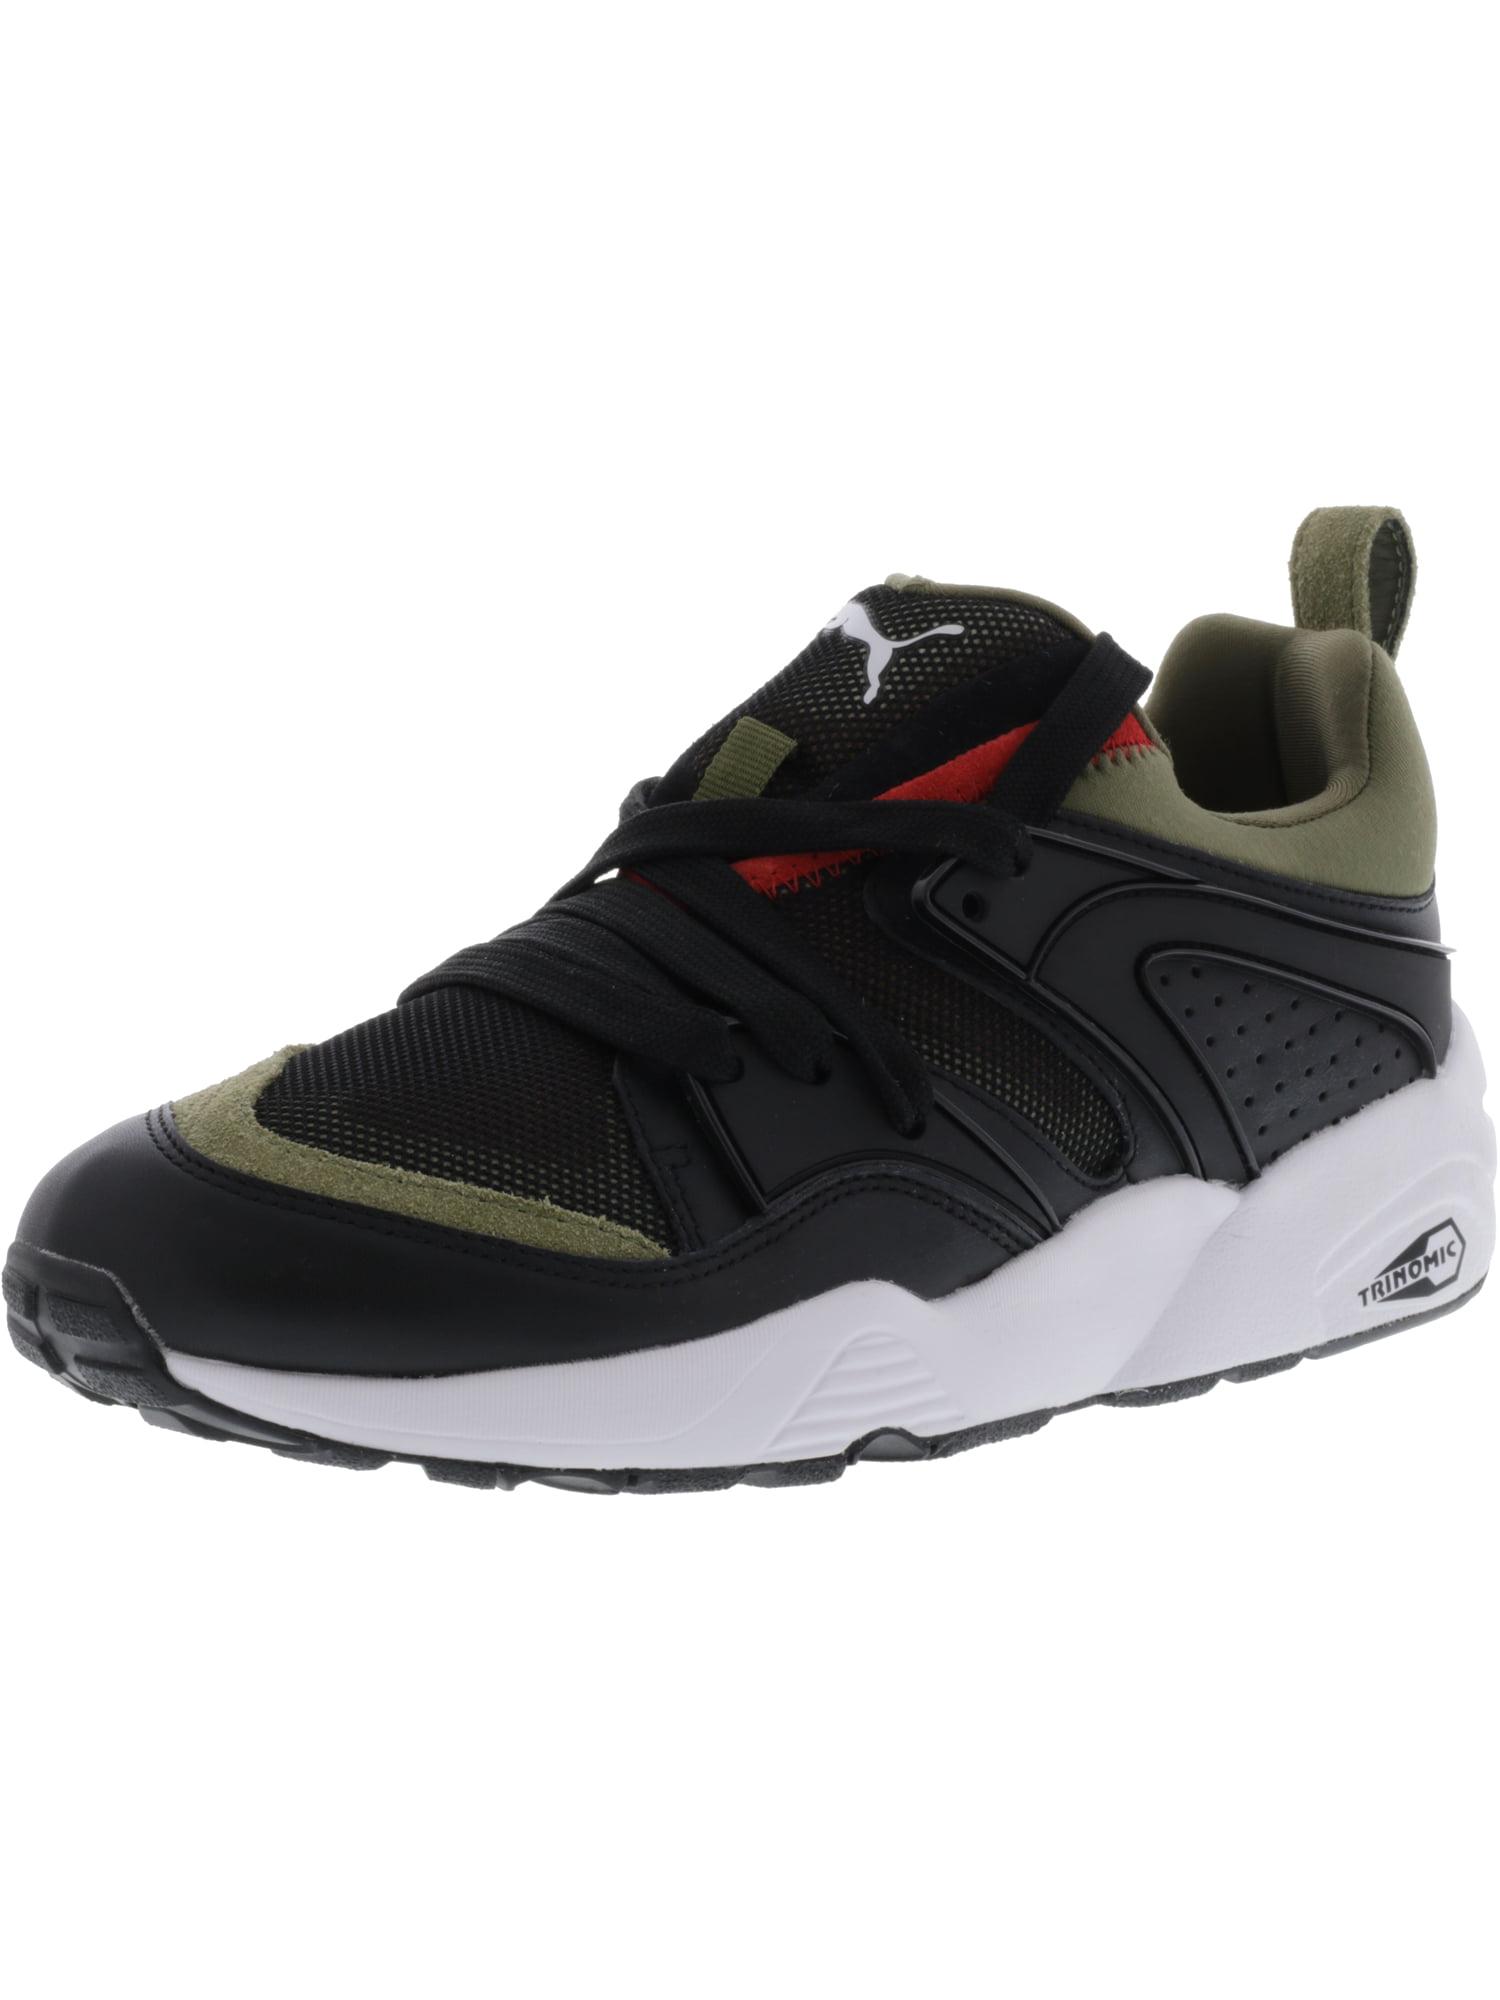 Puma Men's Blaze Of Glory Streetblock Black / Burnt Olive Ankle-High Canvas Fashion Sneaker - 8M